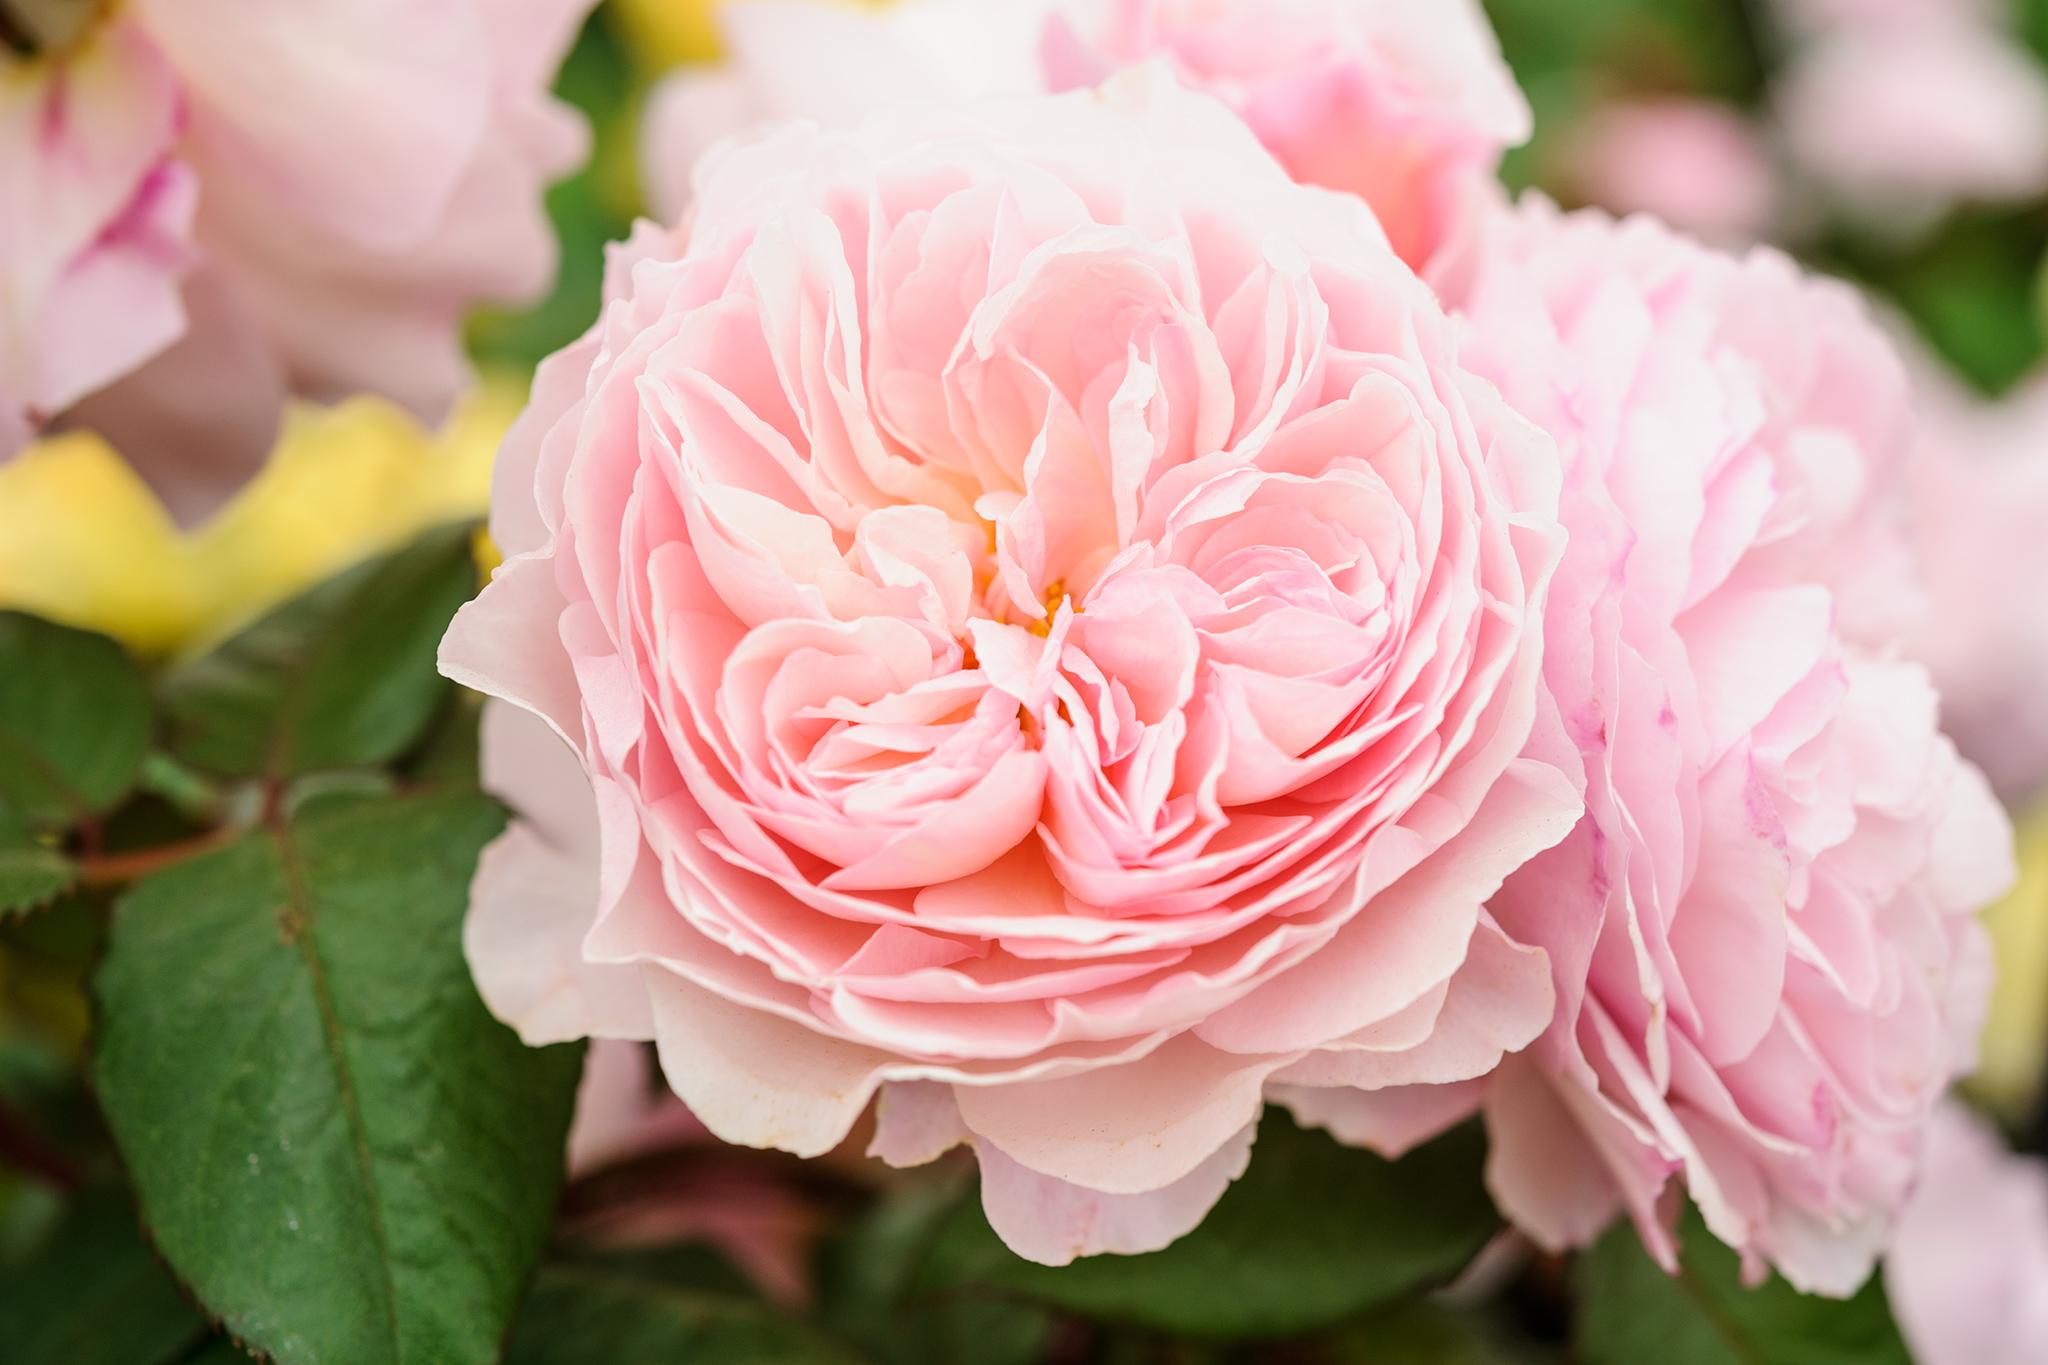 rosa-a-shropshire-lad-13